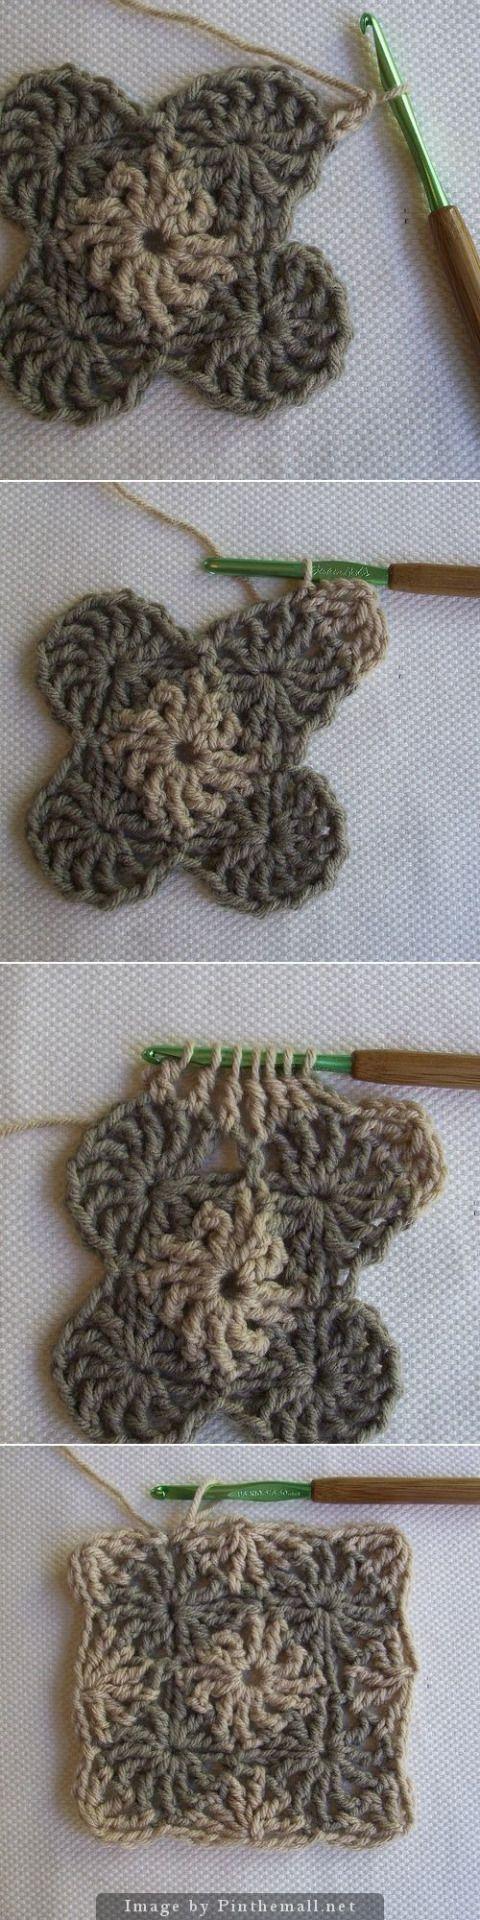 CrochetDad's Wheel Stitch Block Tutorial